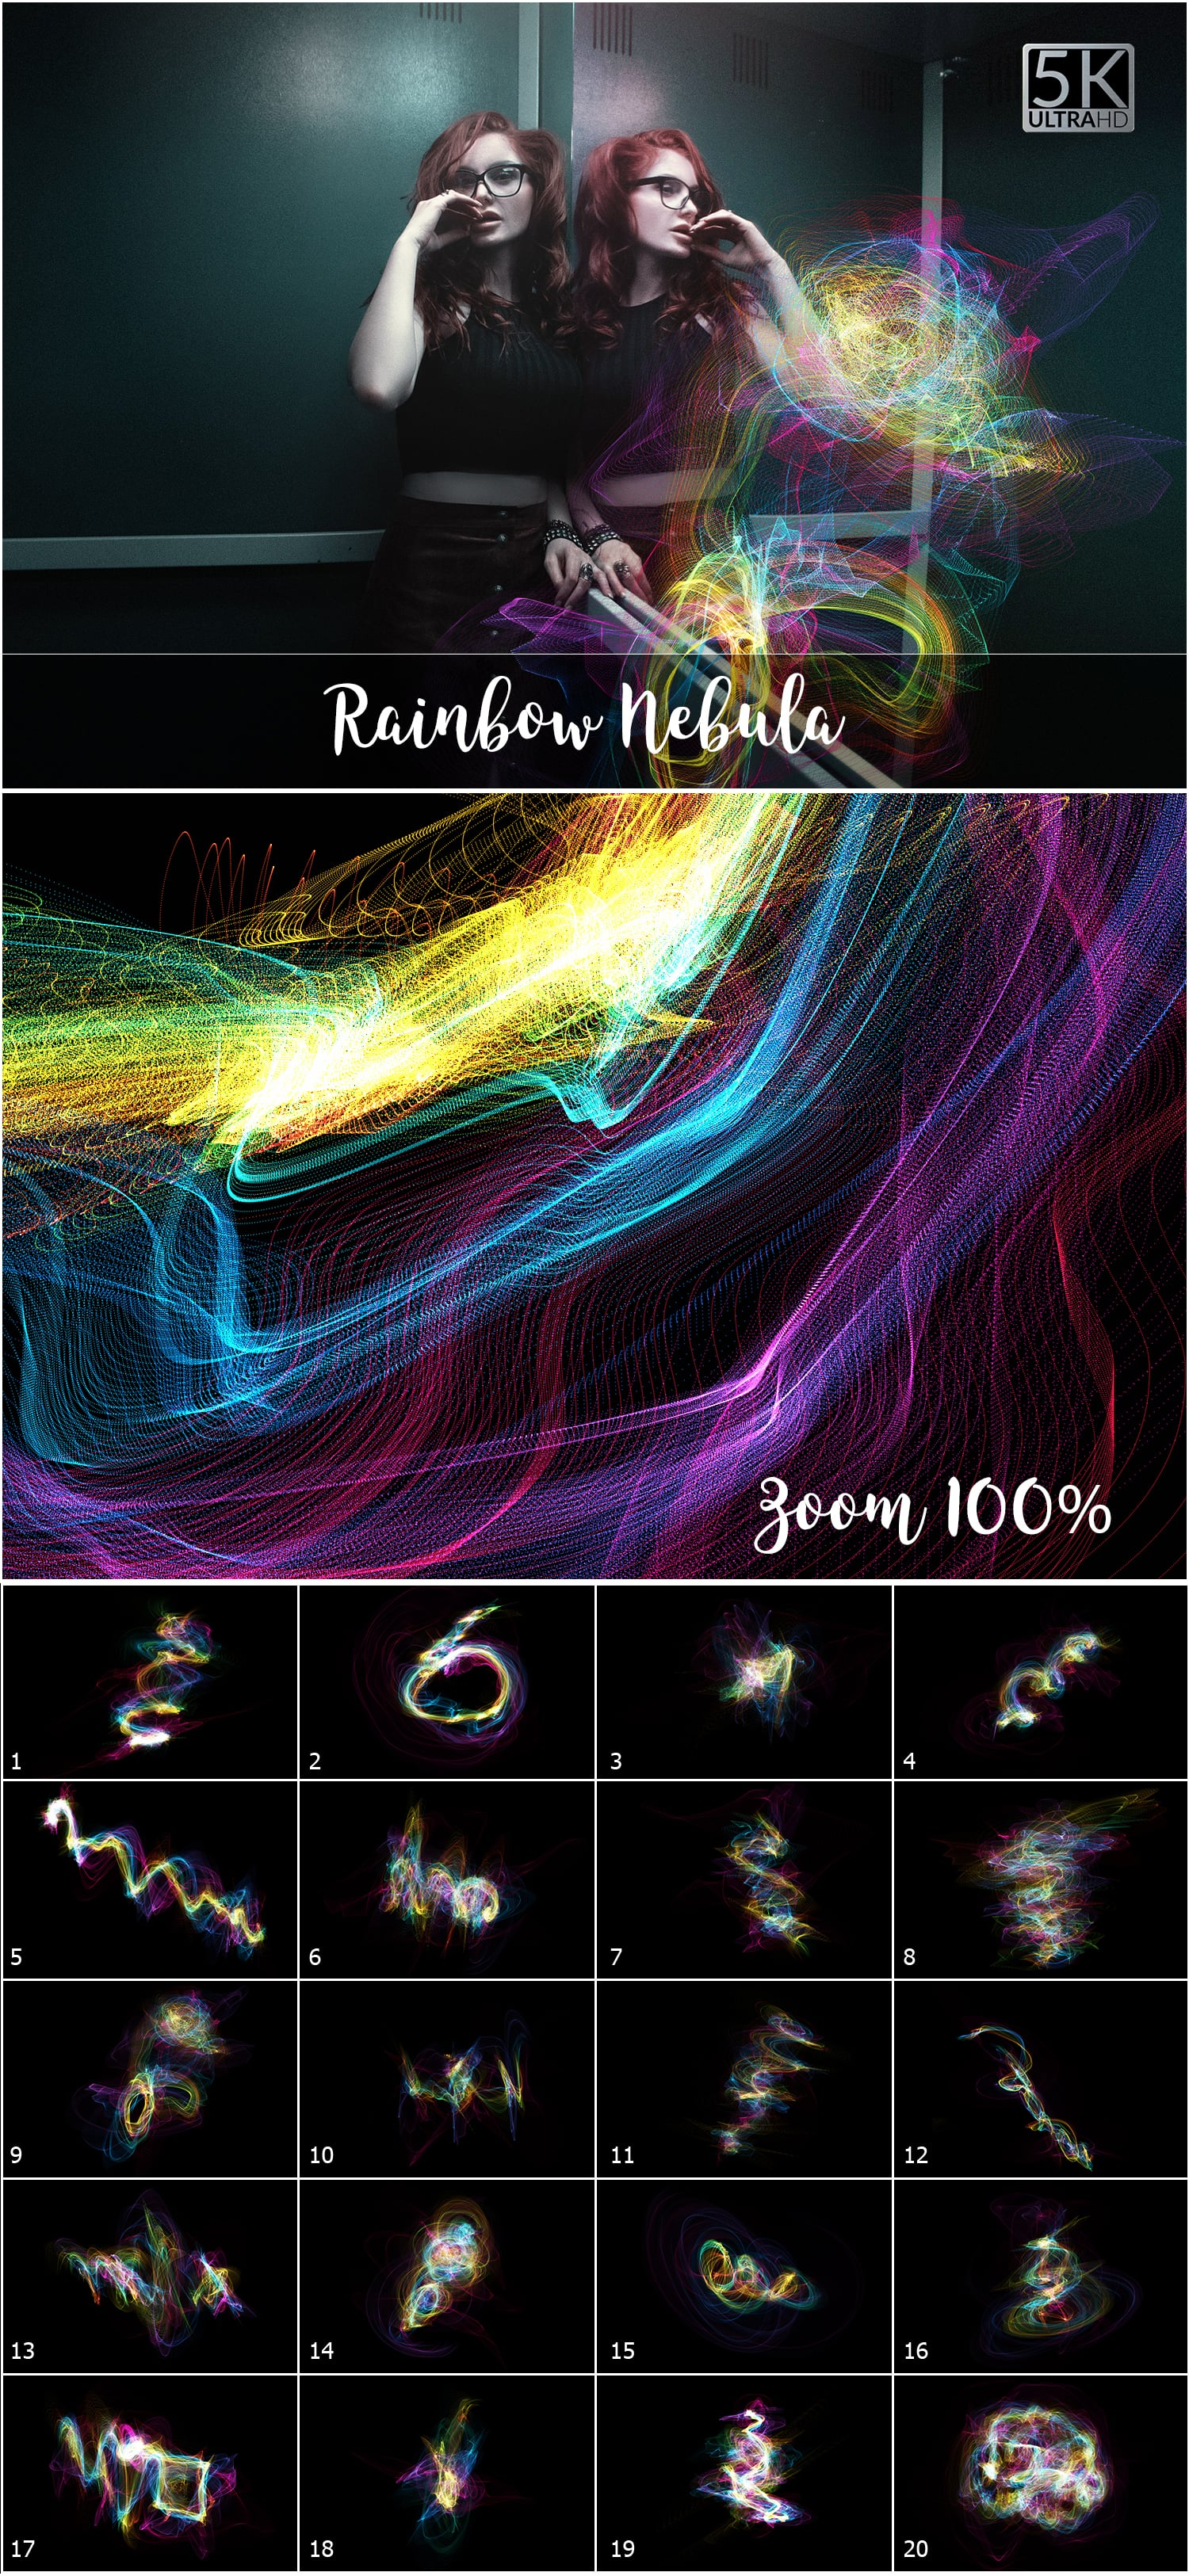 1053 Spectacular Overlays png - Only $18! - Rainbow Nebula